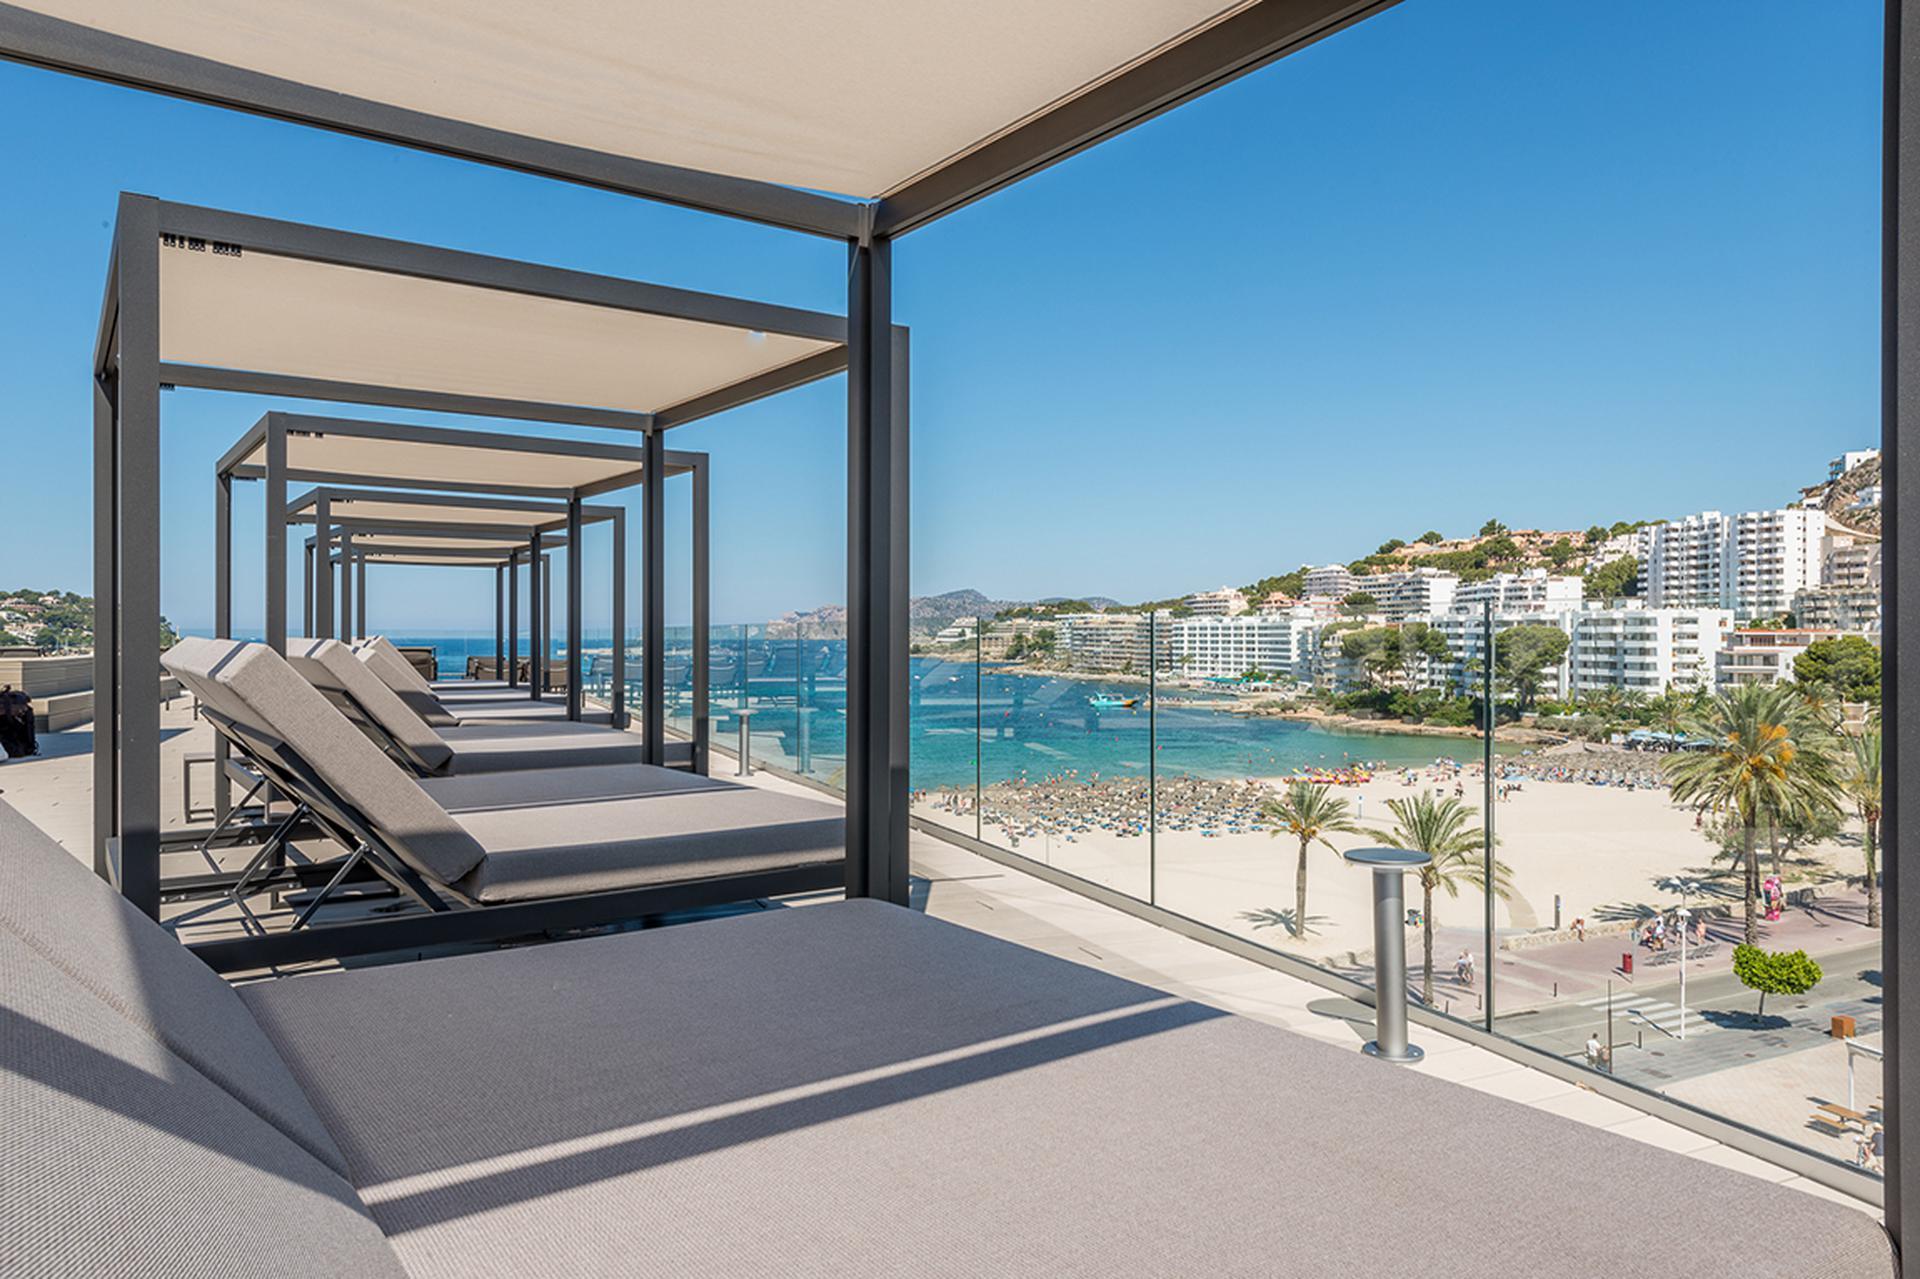 Hotel h10 casa del mar mallorca spanien sunweb - Casa del mar palma de mallorca ...